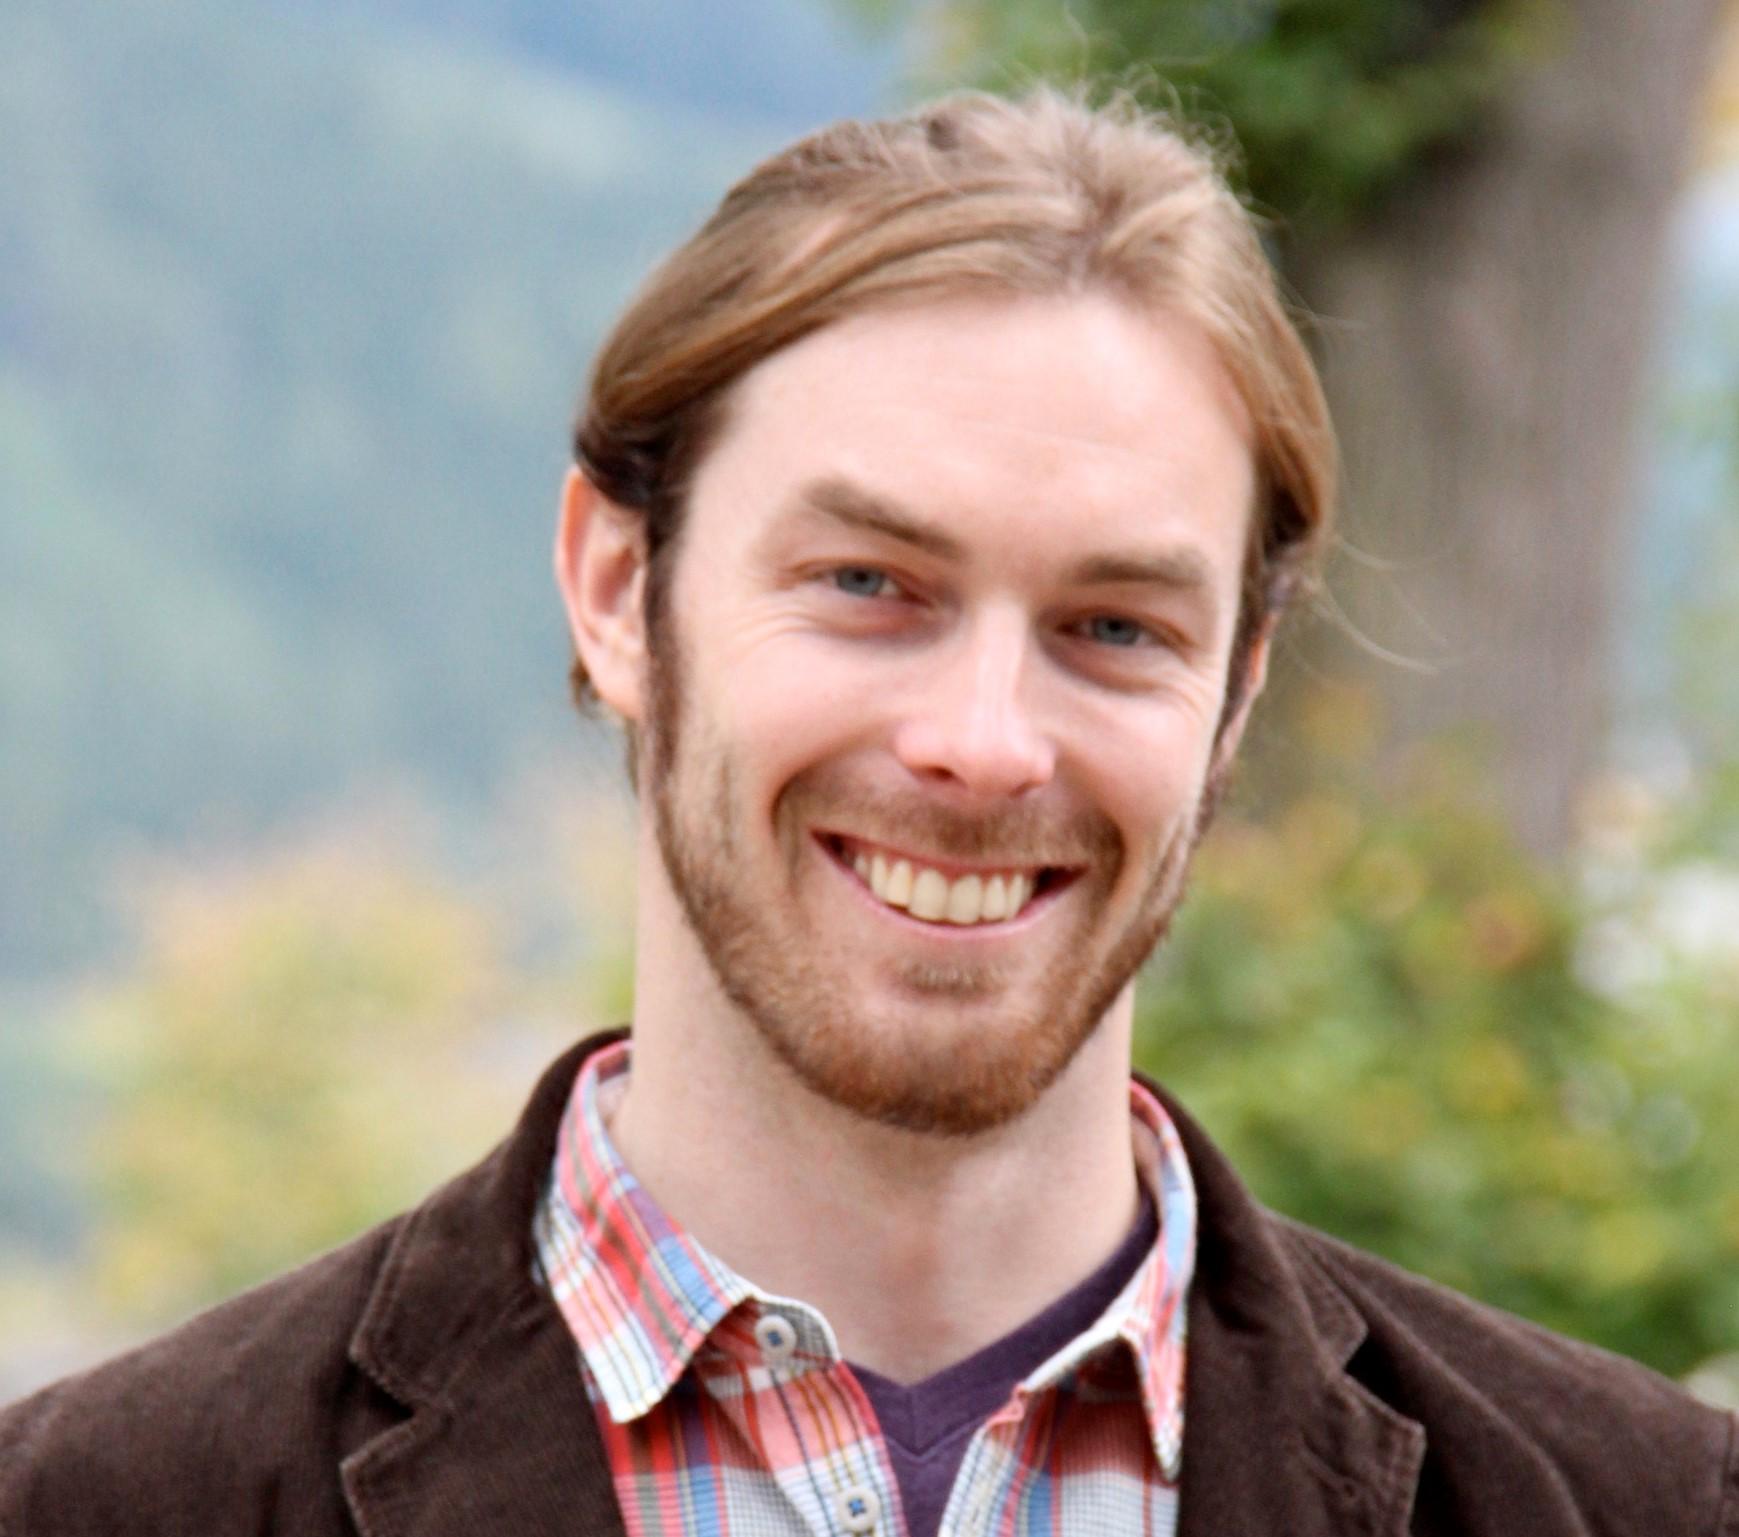 David McCollum UC Davis ARCS Northern California Scholar